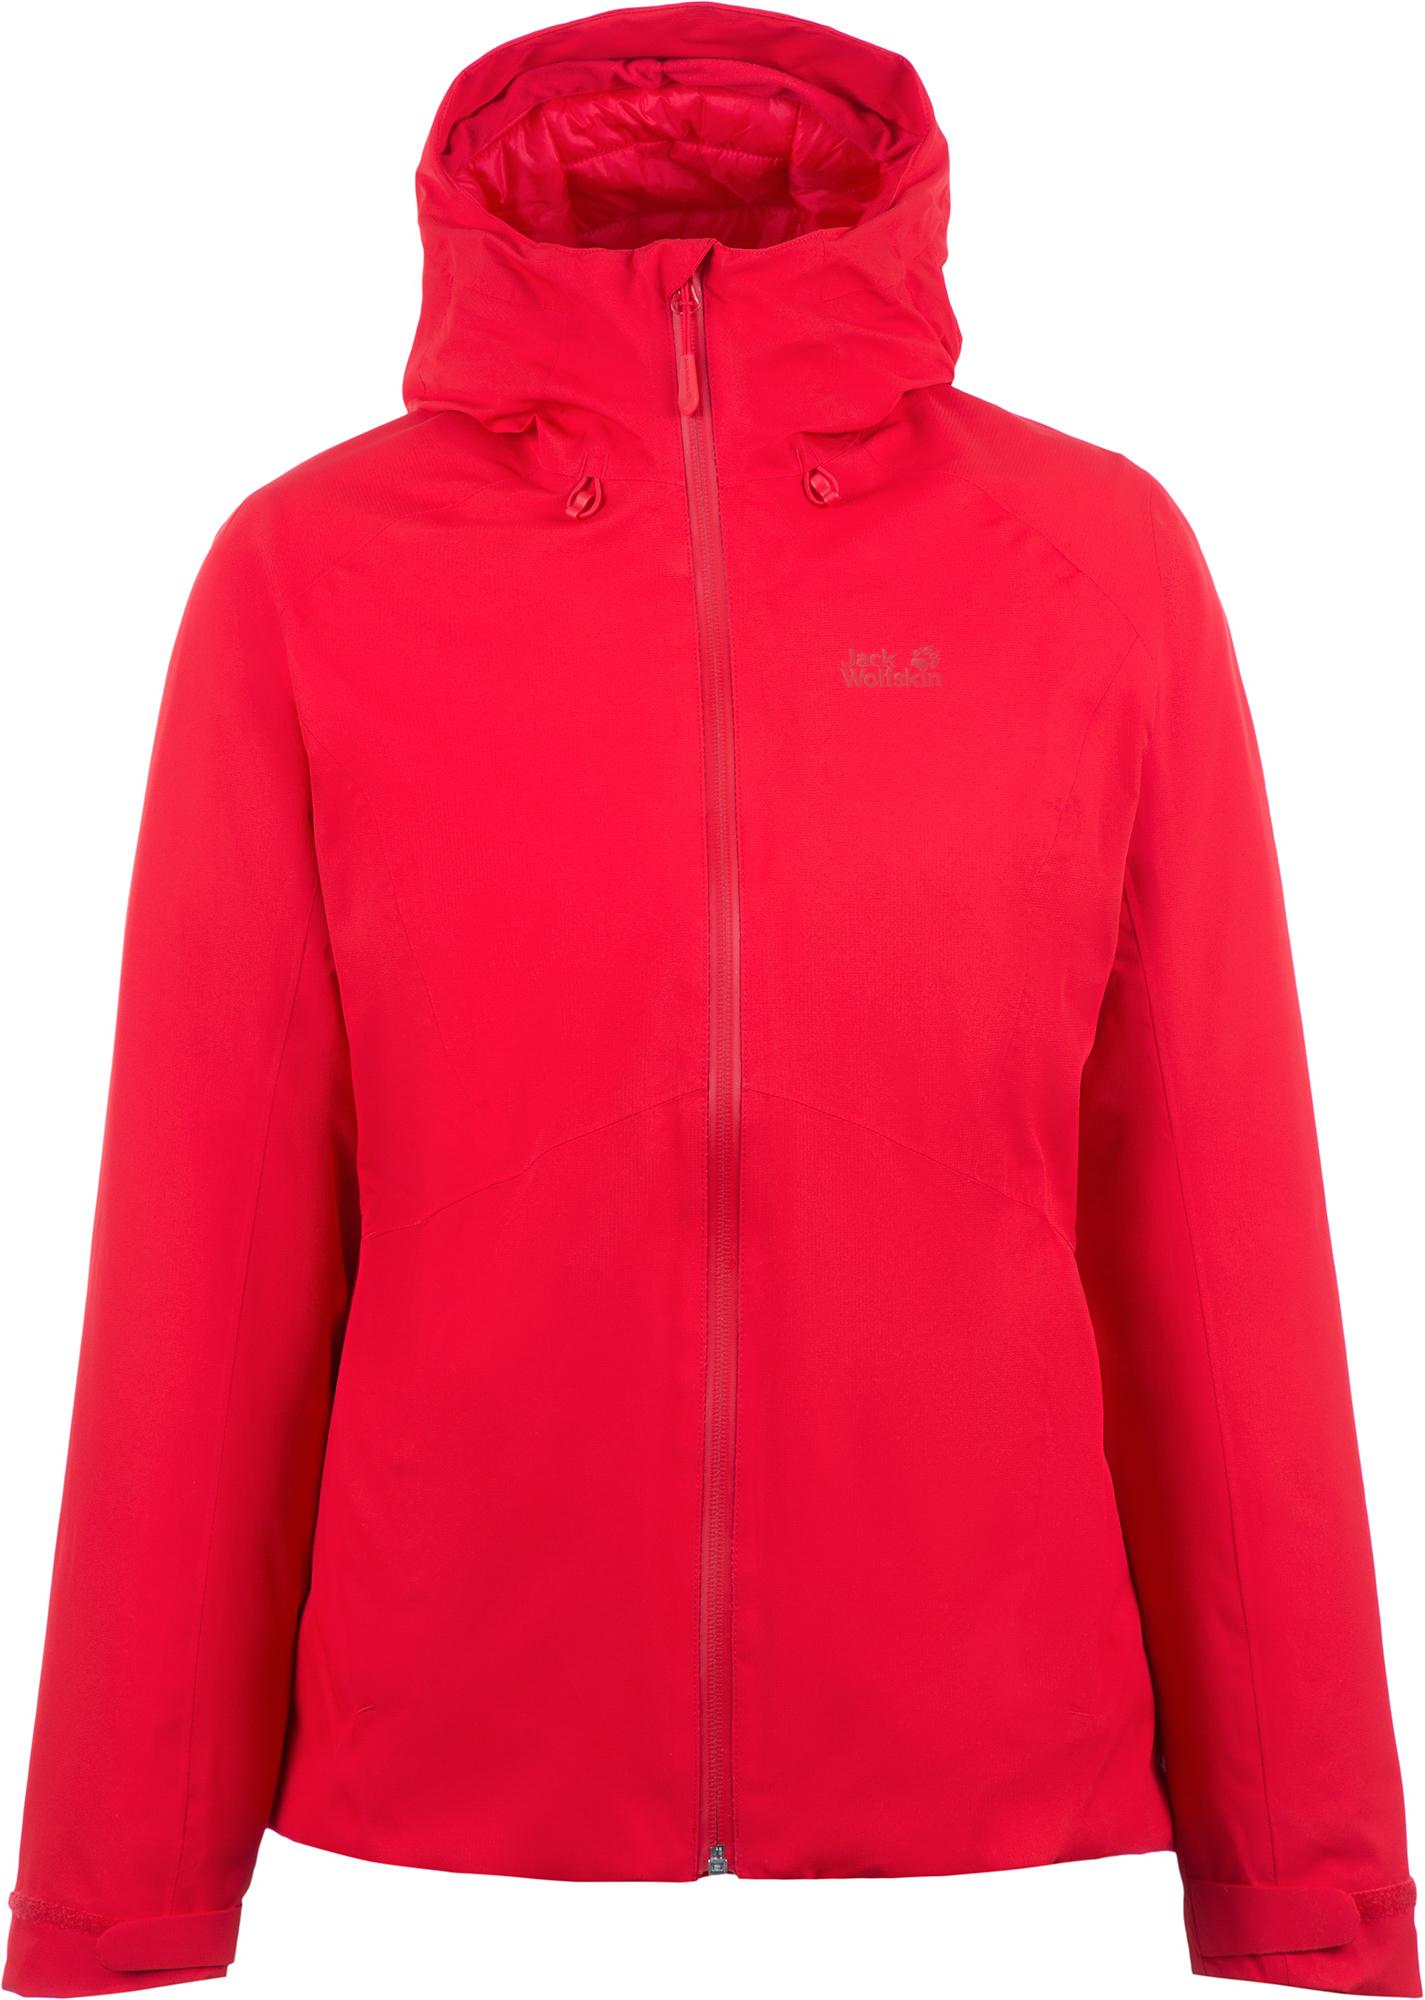 лучшая цена Jack Wolfskin Куртка утепленная женская Jack Wolfskin Argon, размер 52-54